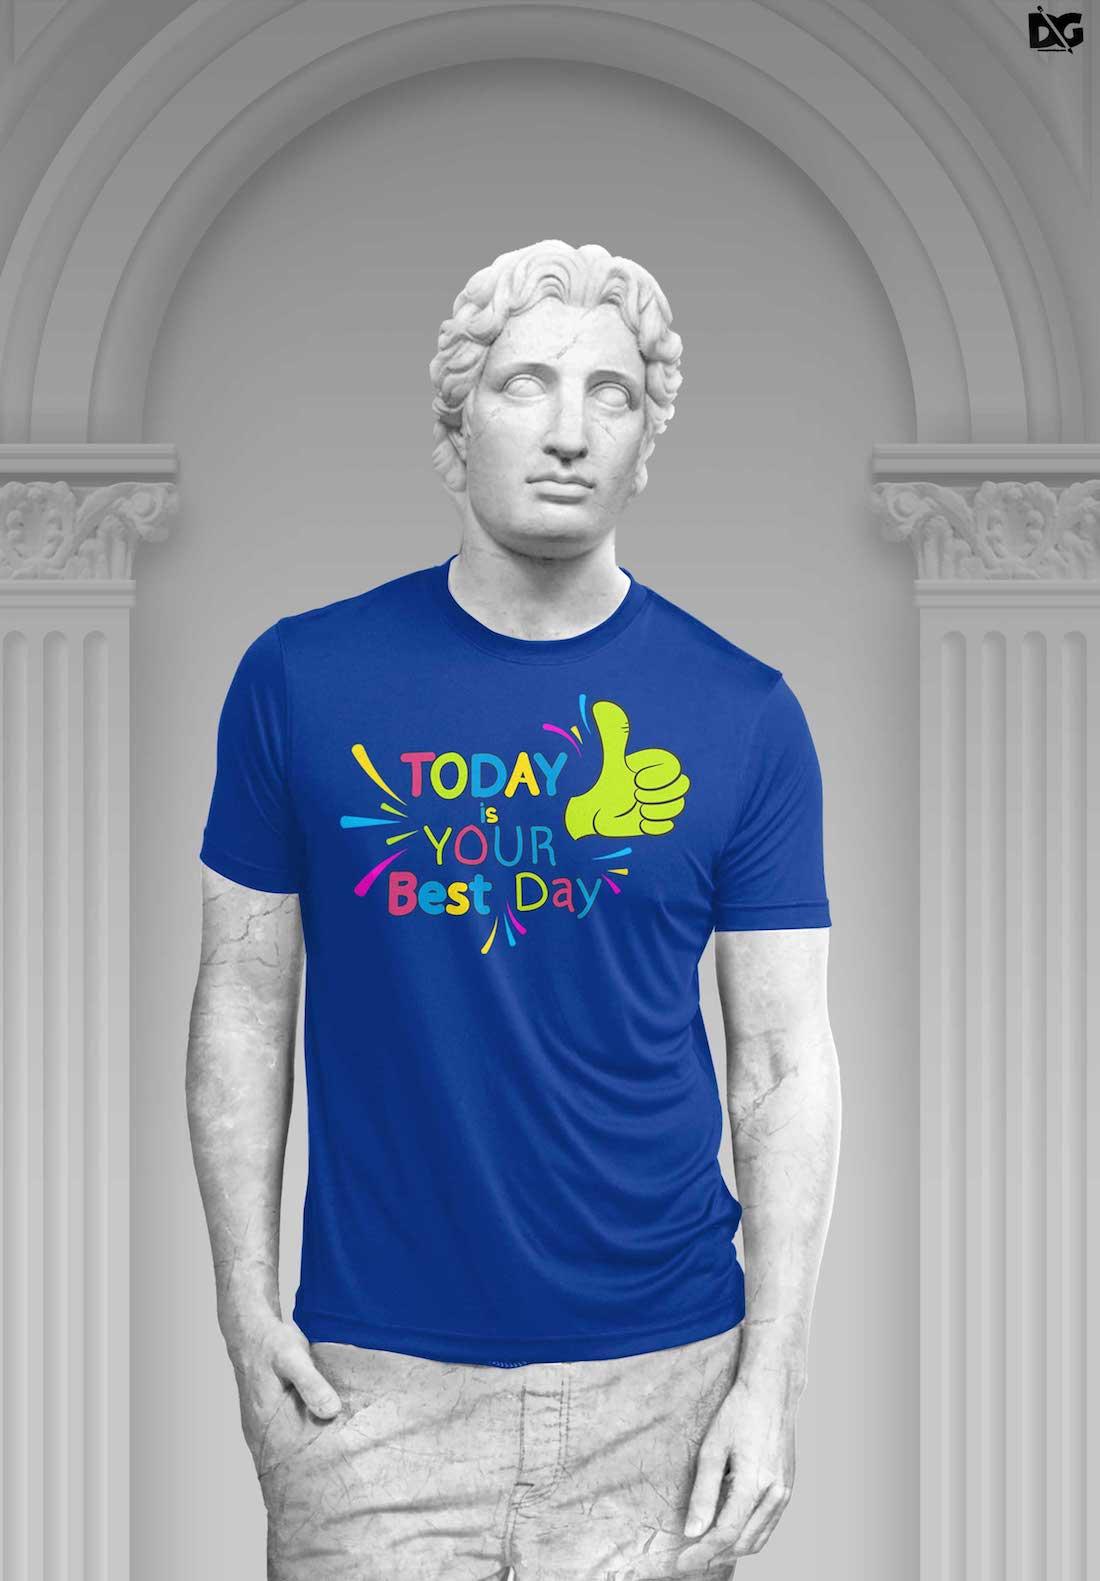 free download blue t-shirt design psd mockup